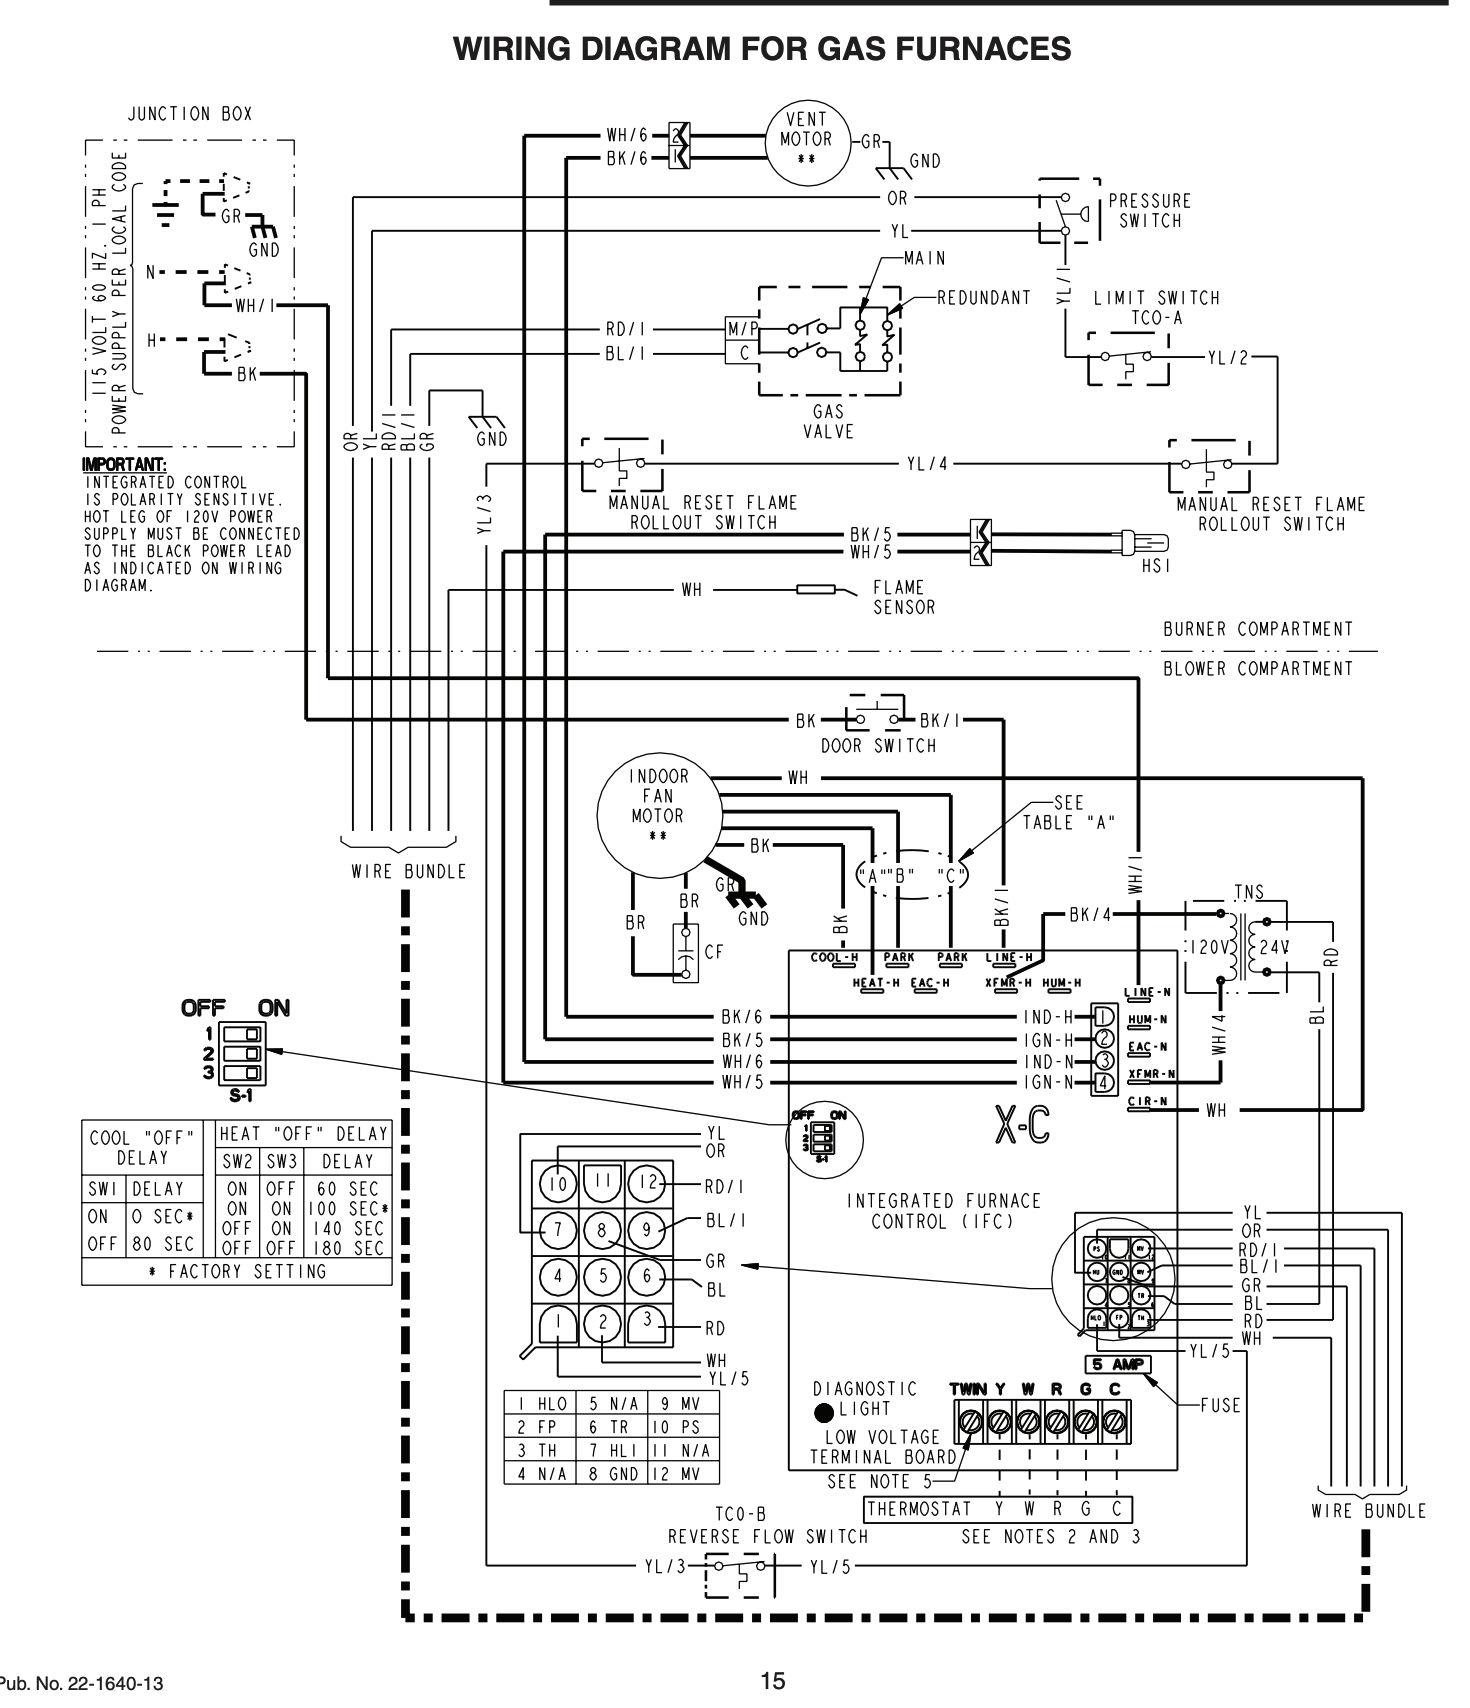 [WLLP_2054]   CD_3162] Ford Module Wiring Download Diagram | Ford Ignition Module F5jl 12a297 Da Wiring Diagram |  | Viewor M Blikvitt Librar Wiring 101